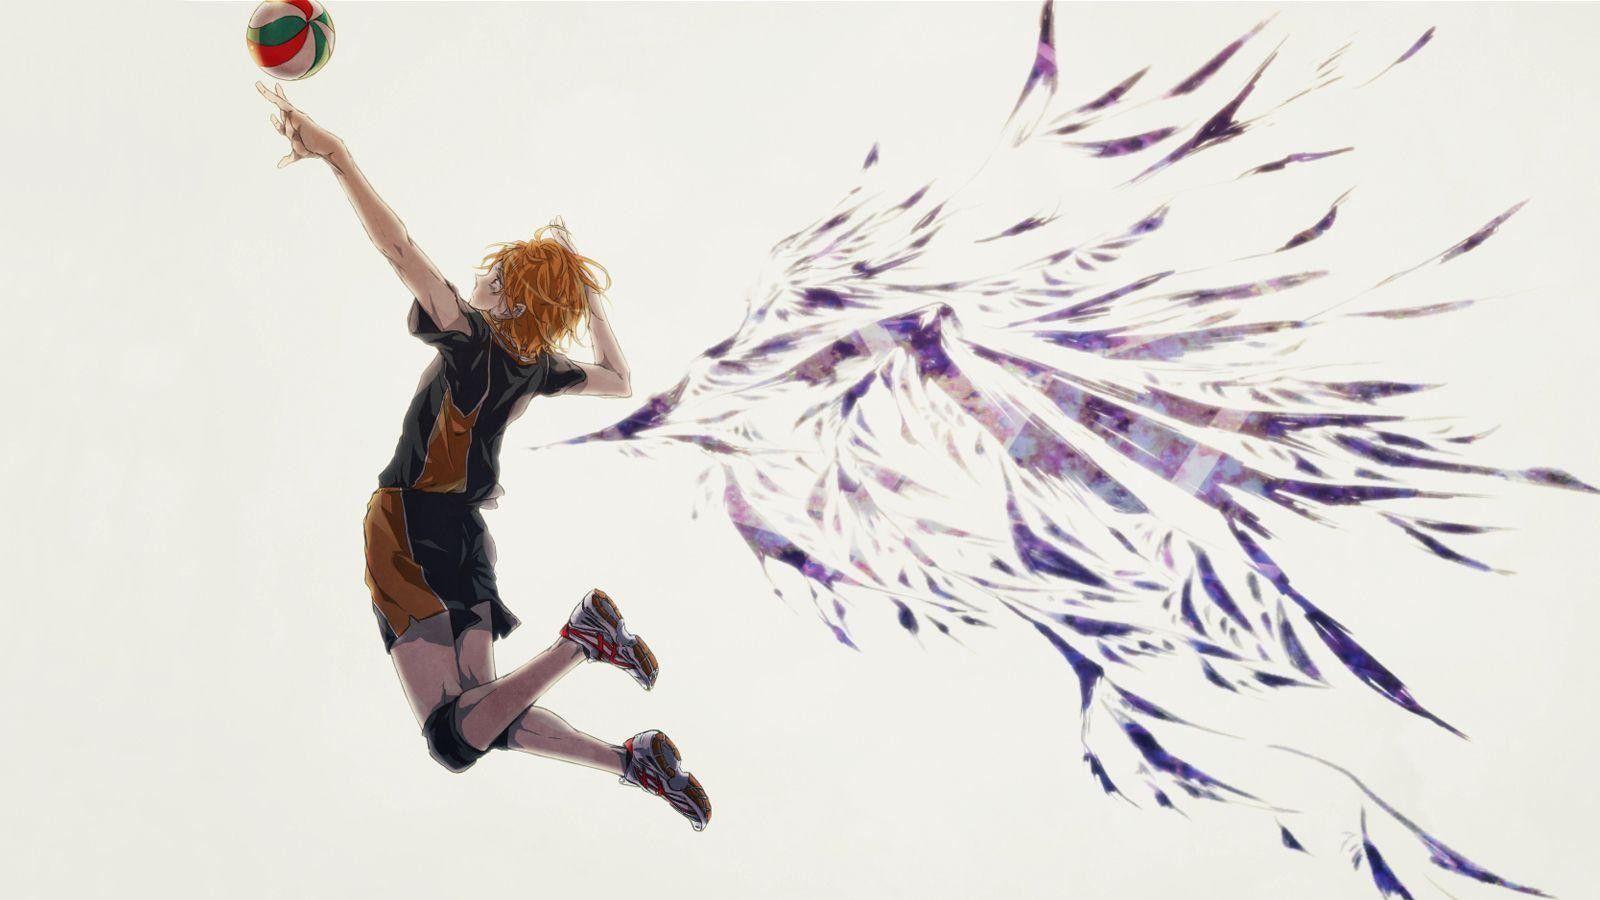 Pin By Shun Him Leung On Anime Haikyuu Anime Haikyuu Wallpaper Haikyuu